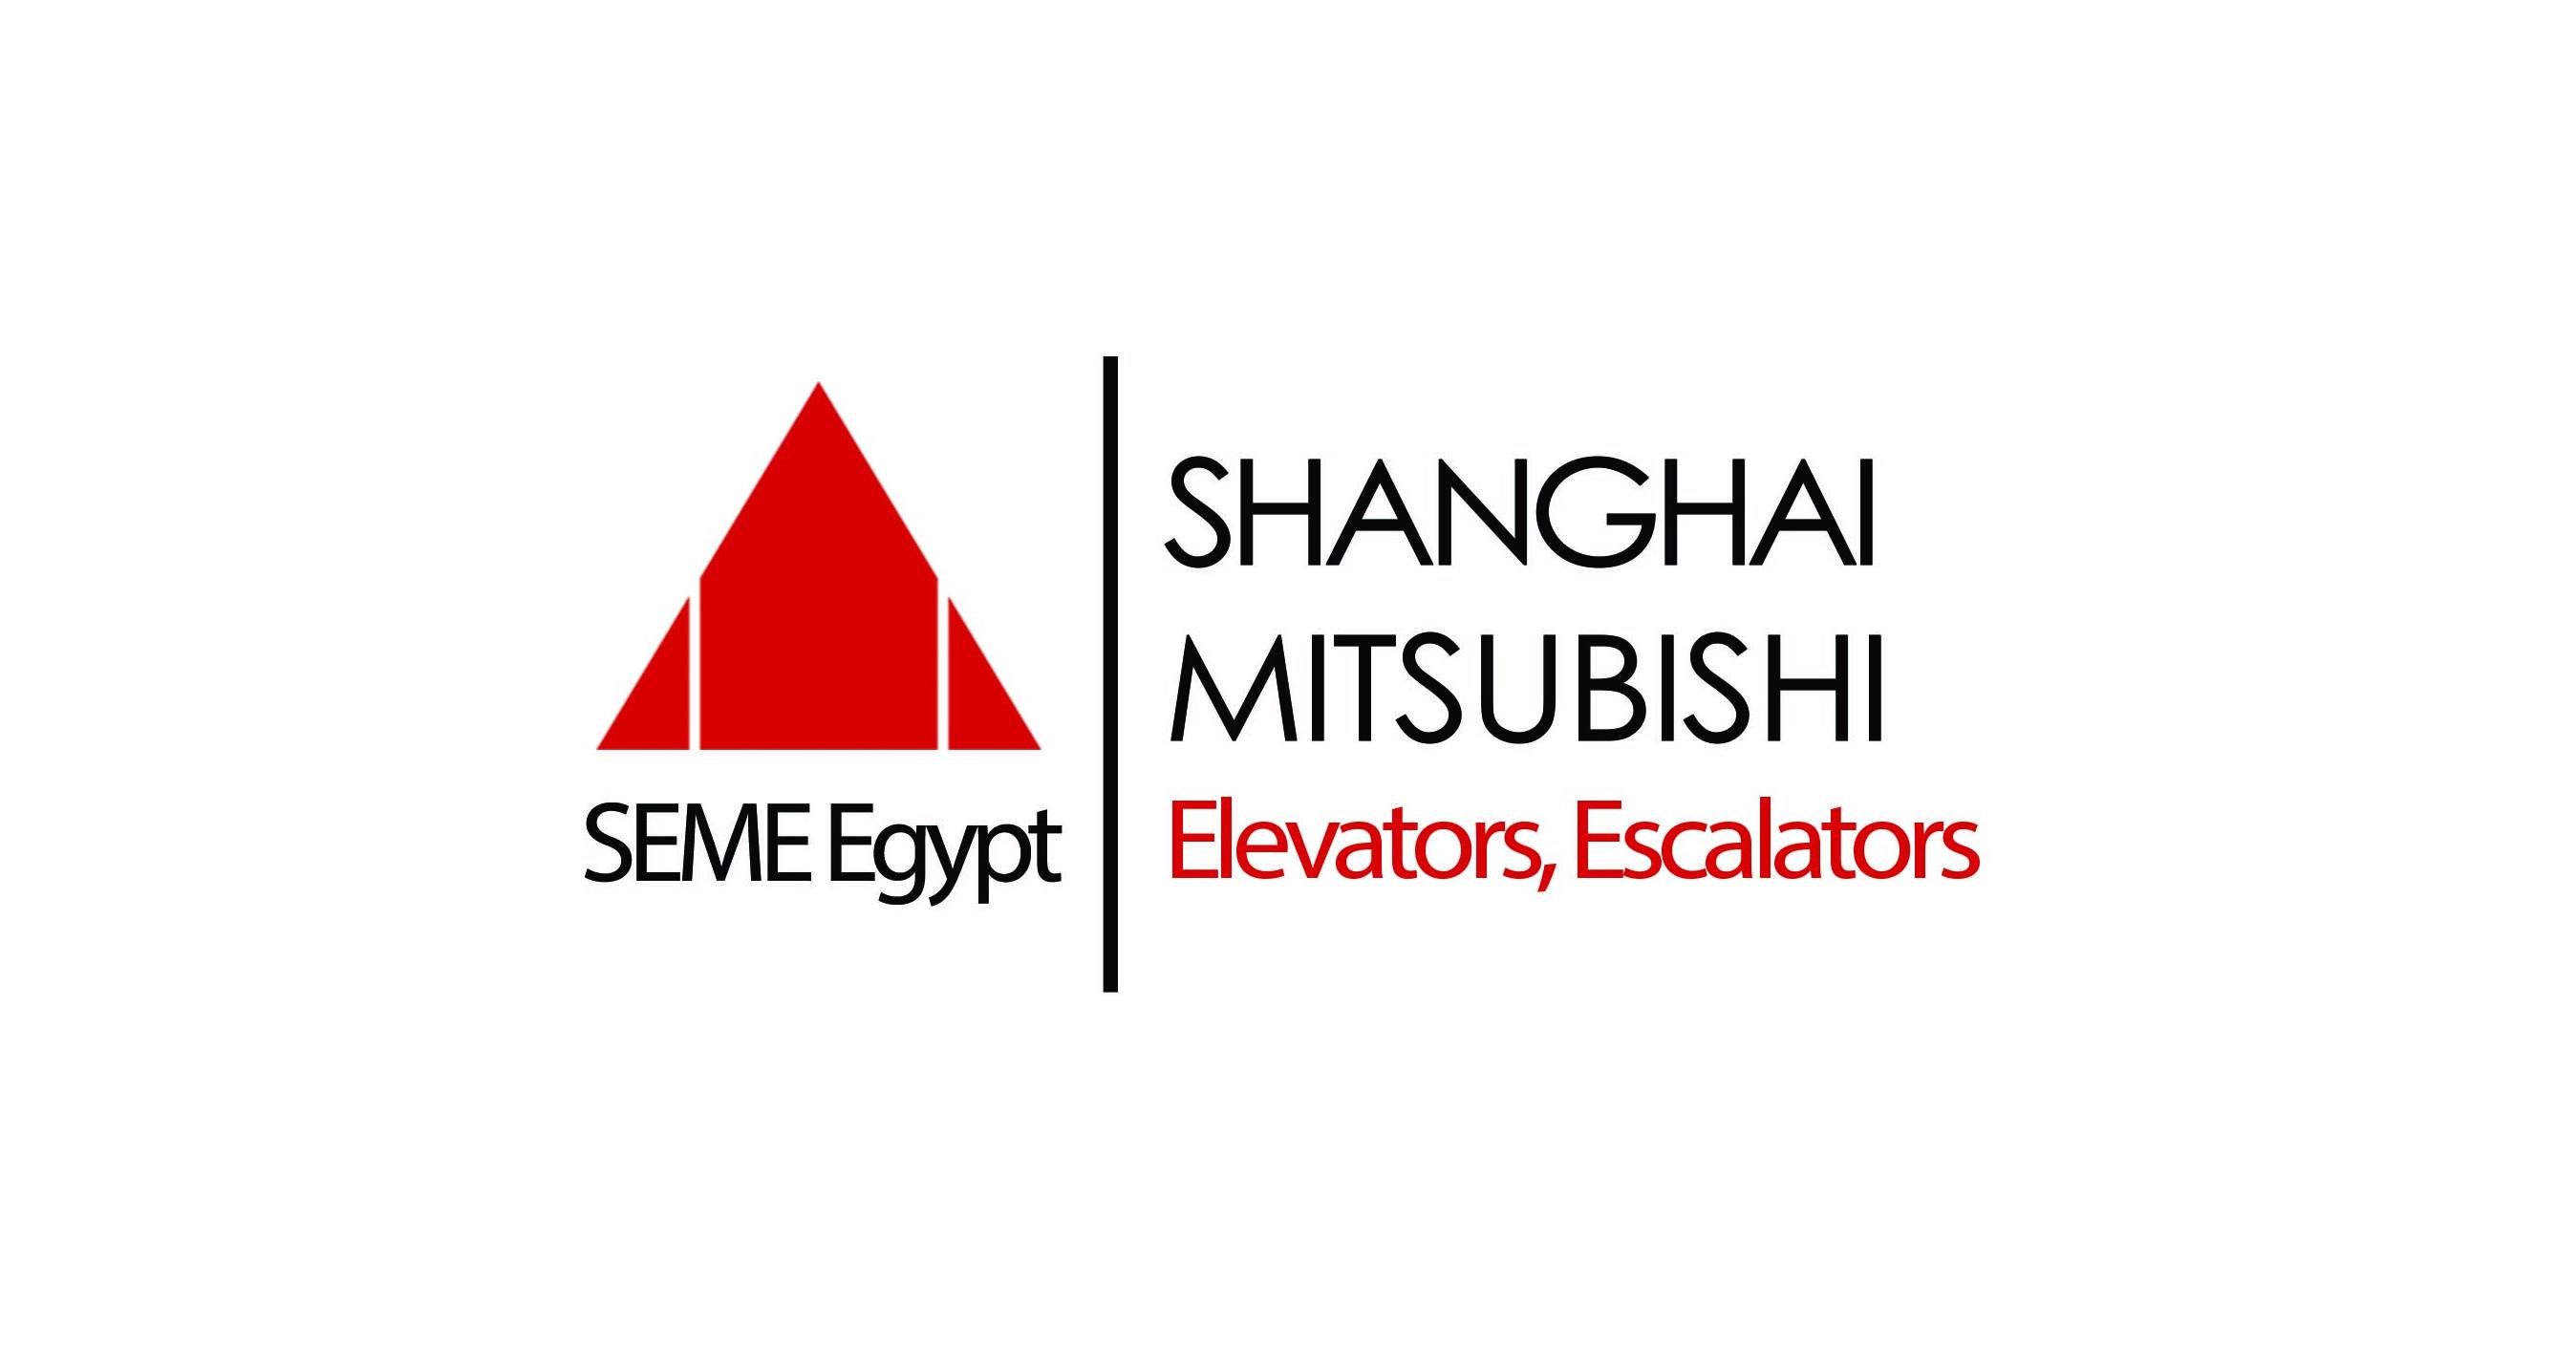 Jobs And Careers At Seme Egypt Mitsubishi Shanghai Elevators And